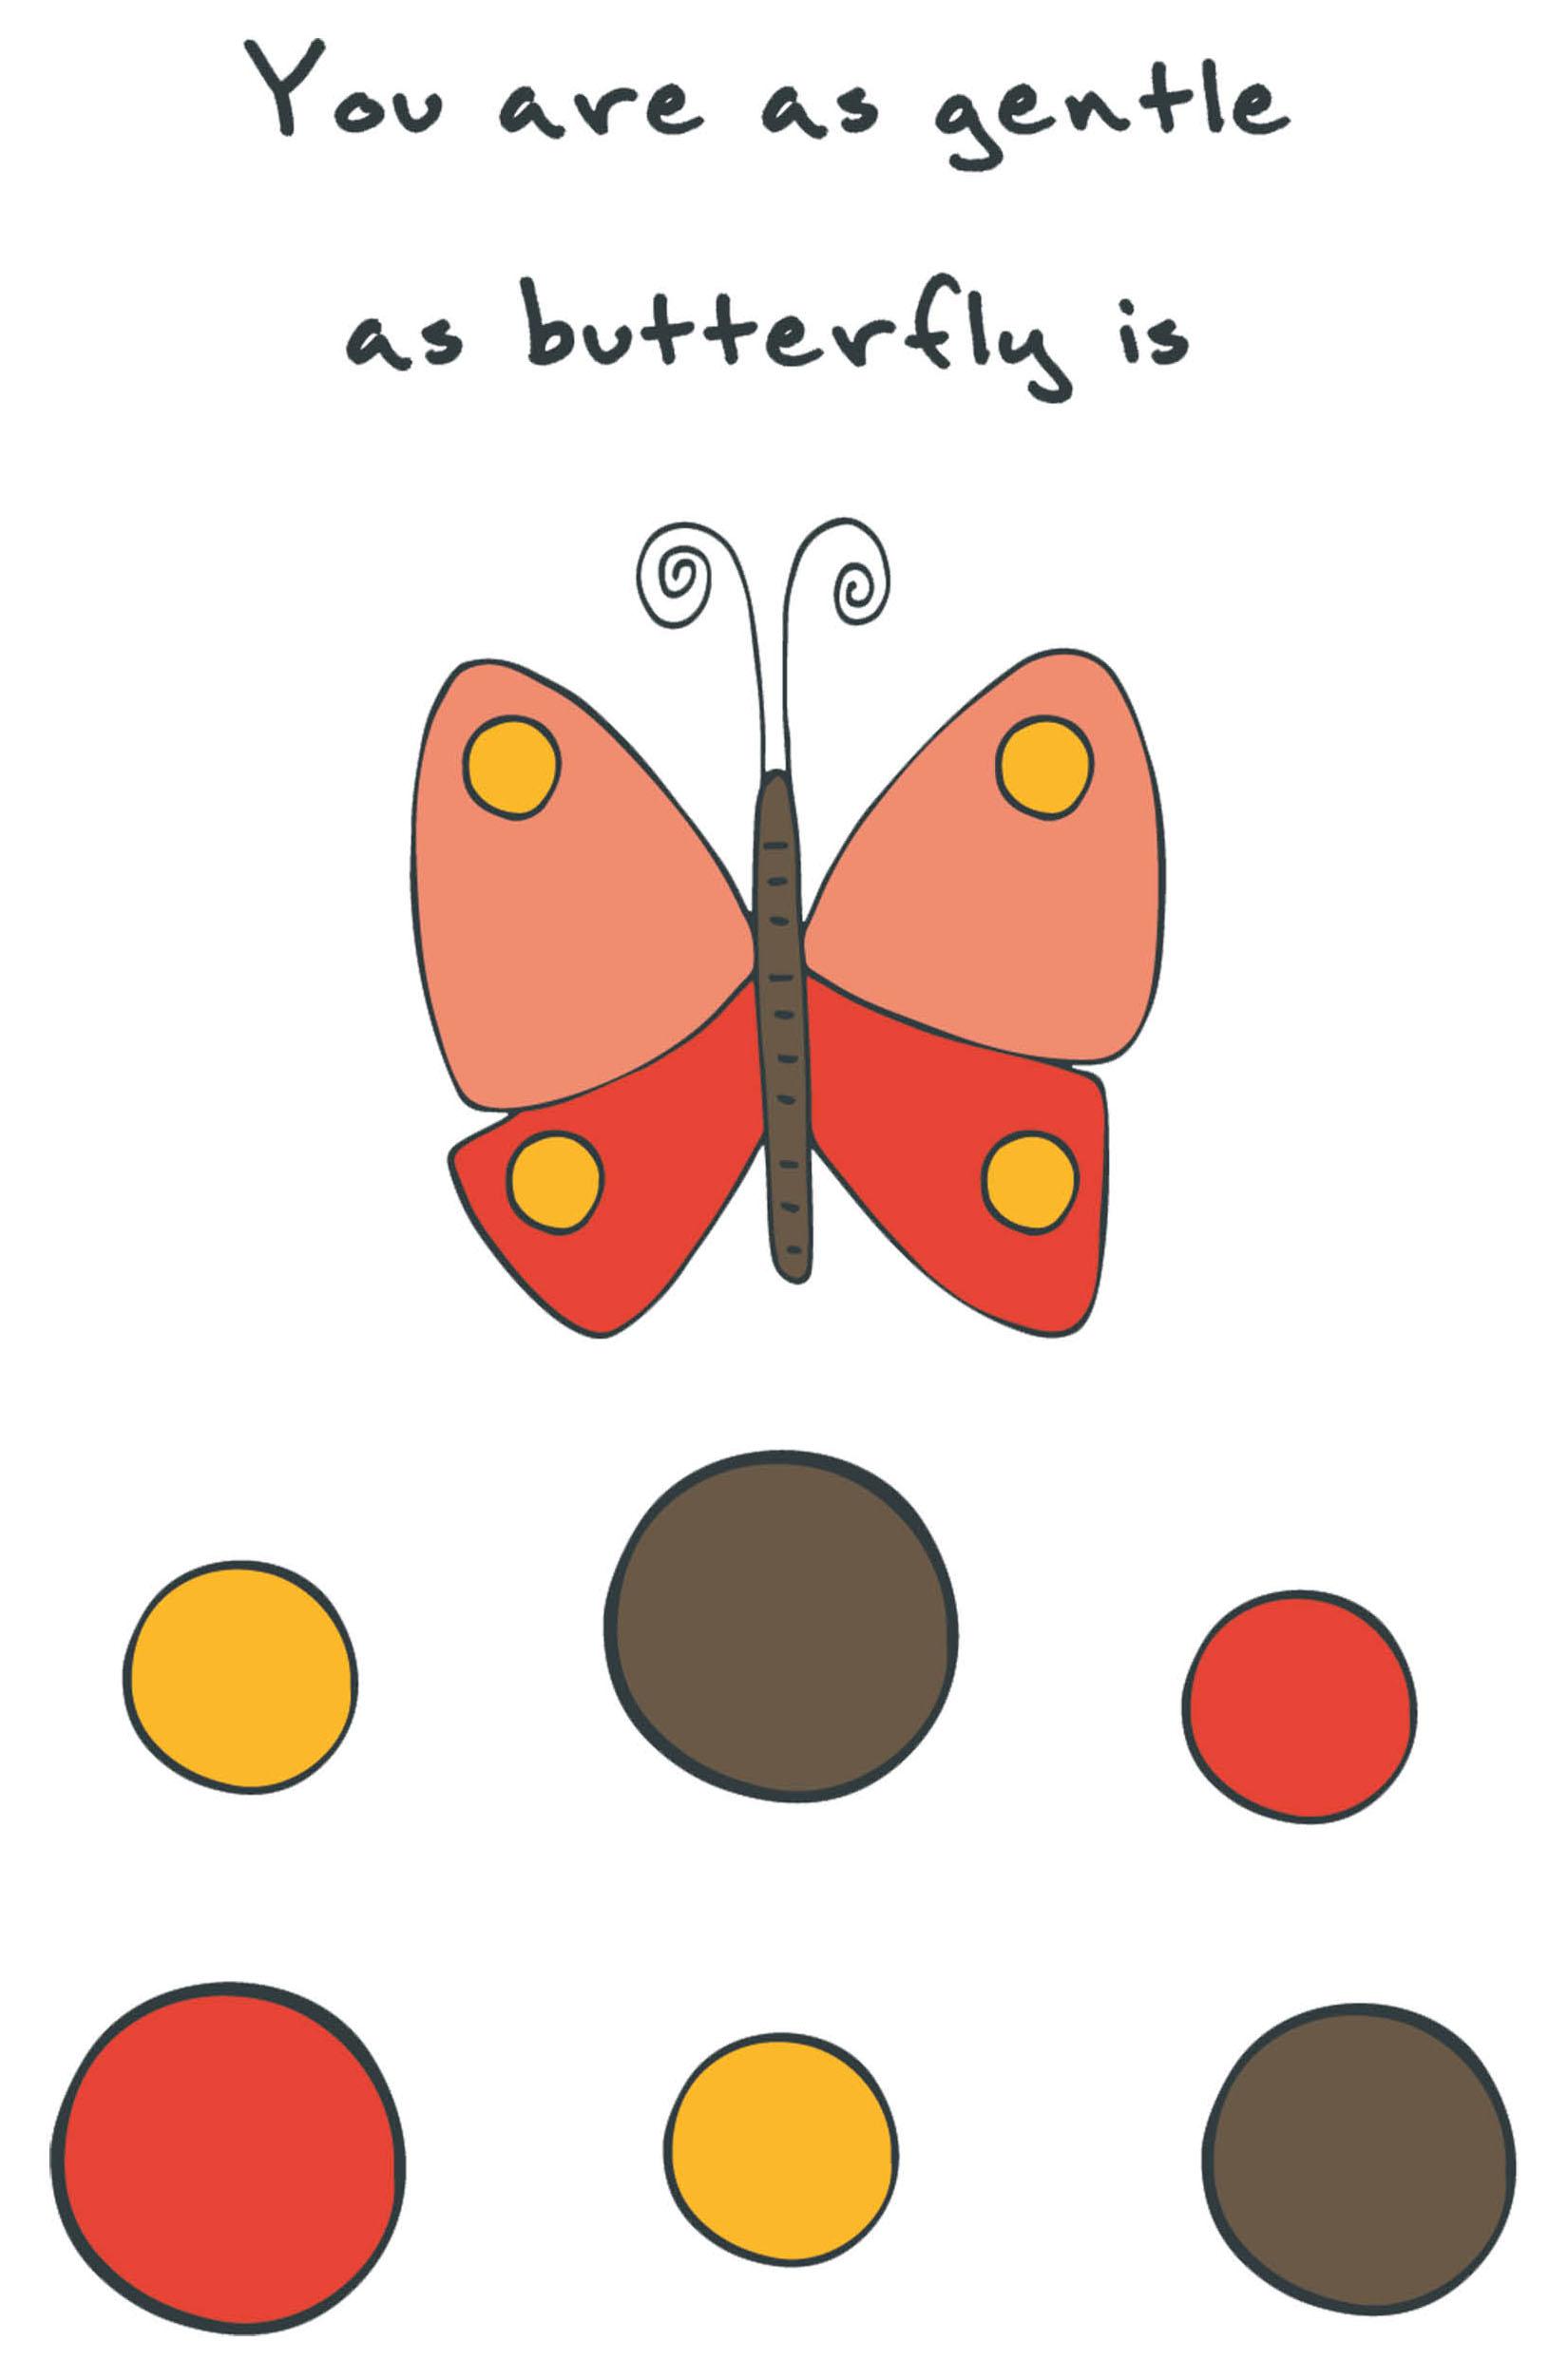 Блокнот для записей You are as gentle as butterfly is (А5)